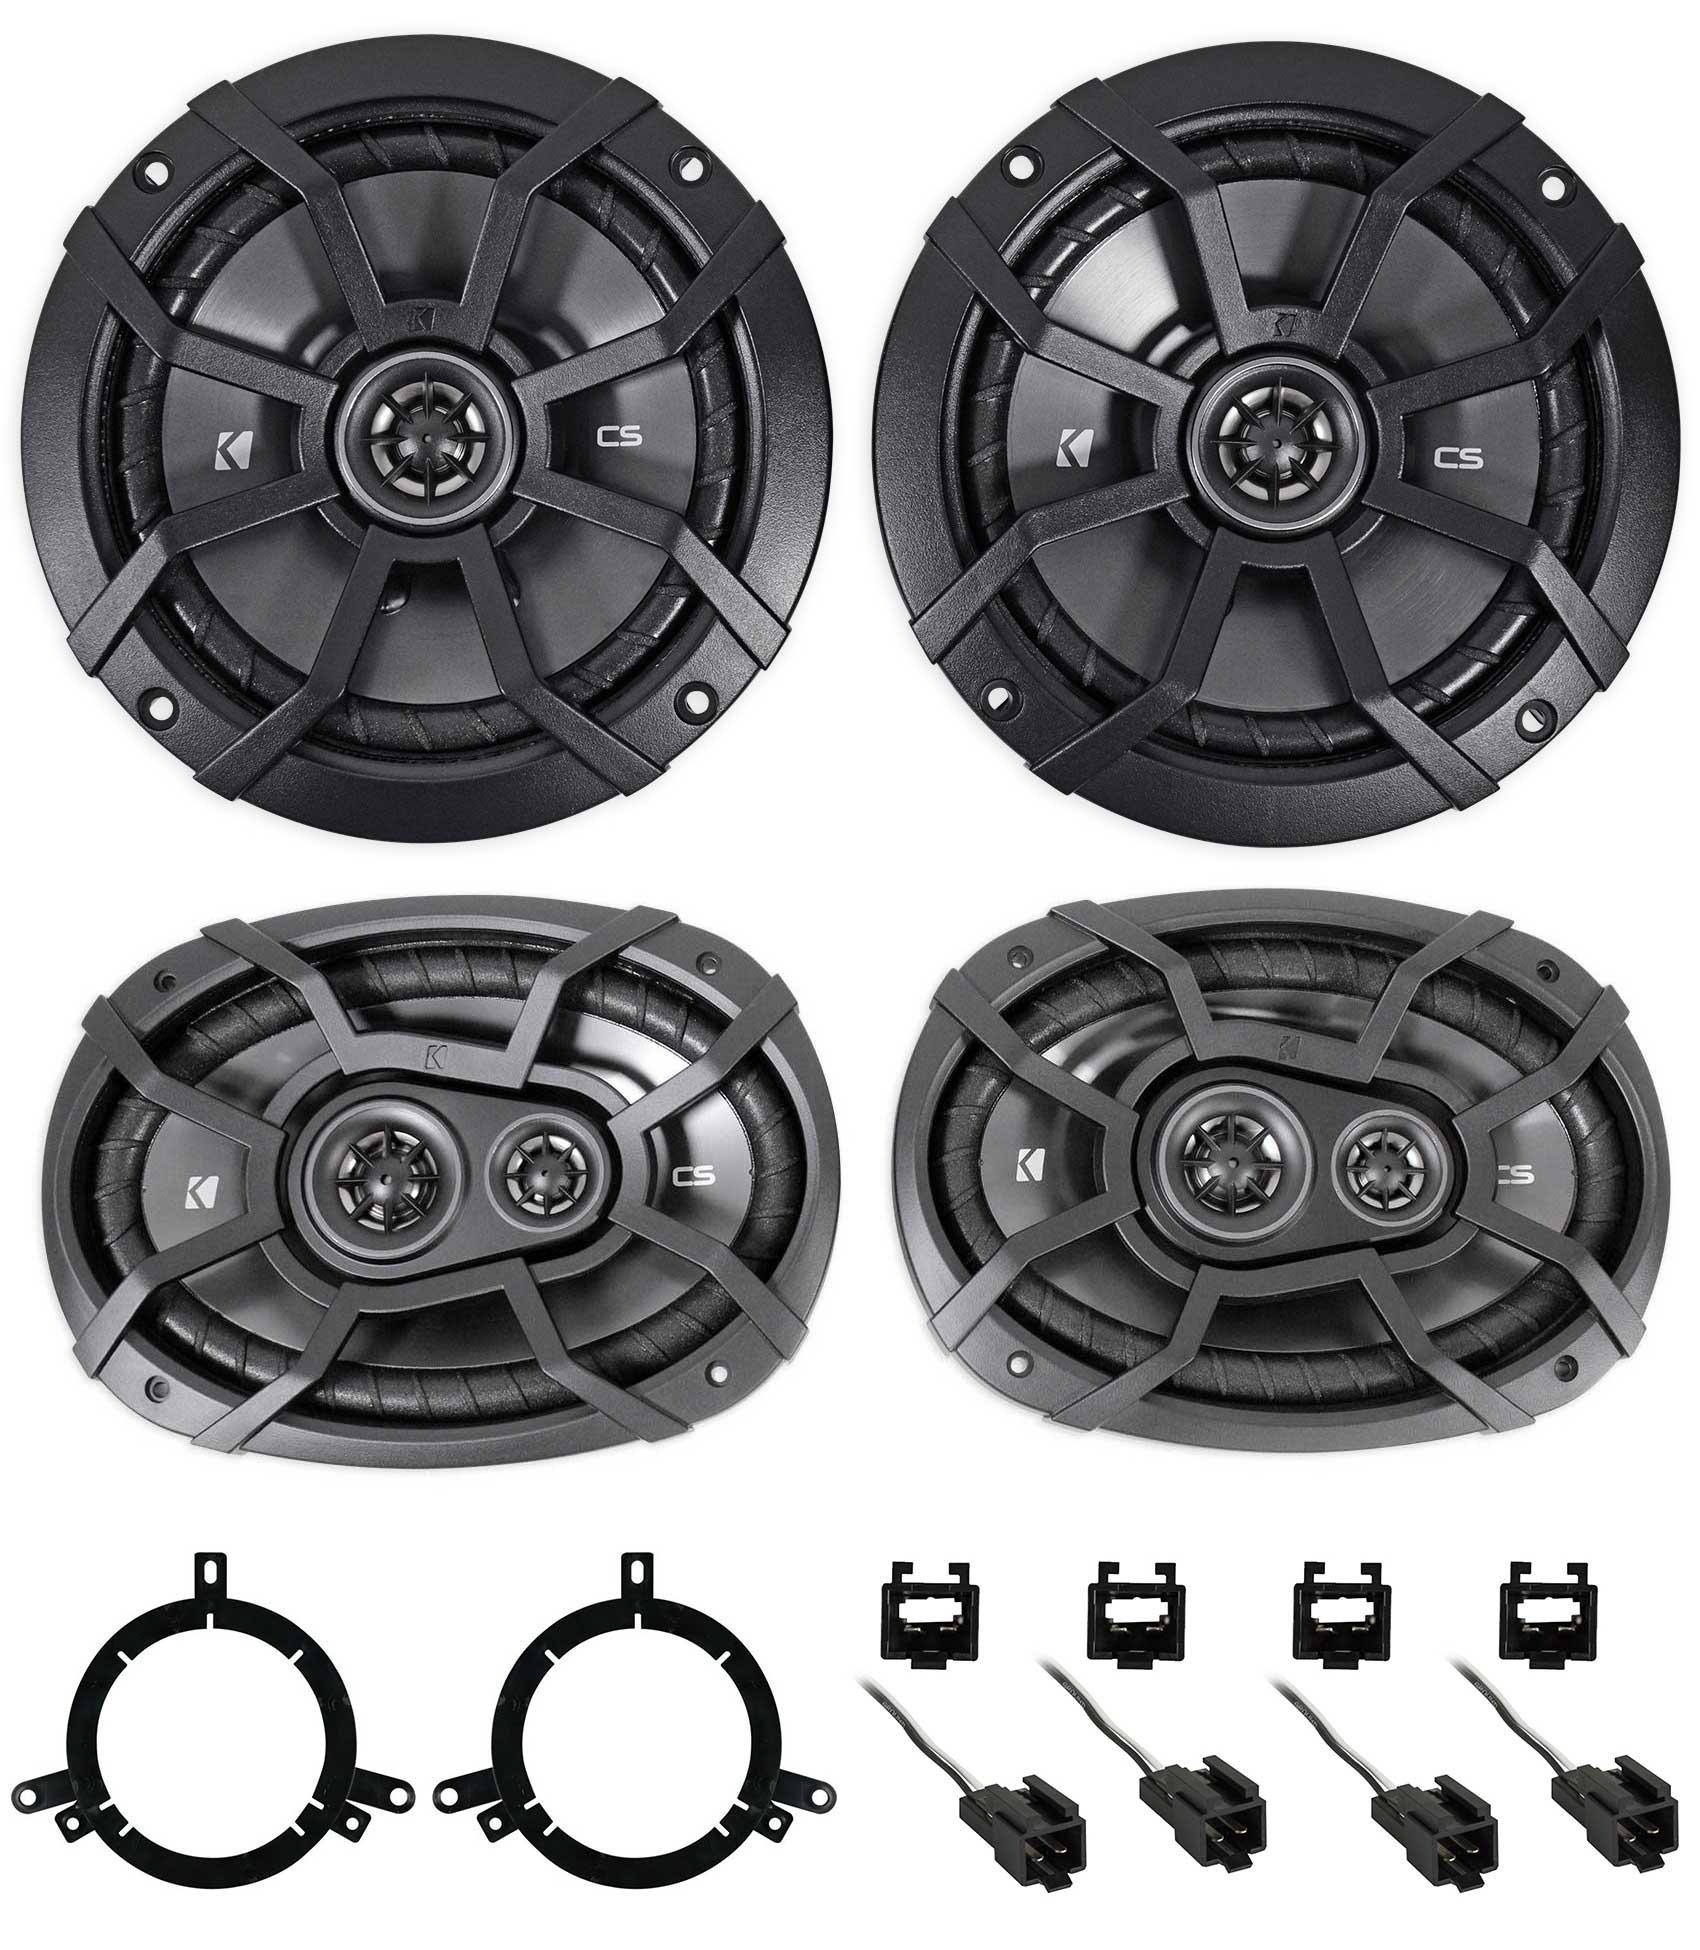 1999-2004 Chrysler 300M Kicker Front + Rear Factory Speaker Replacement Kit